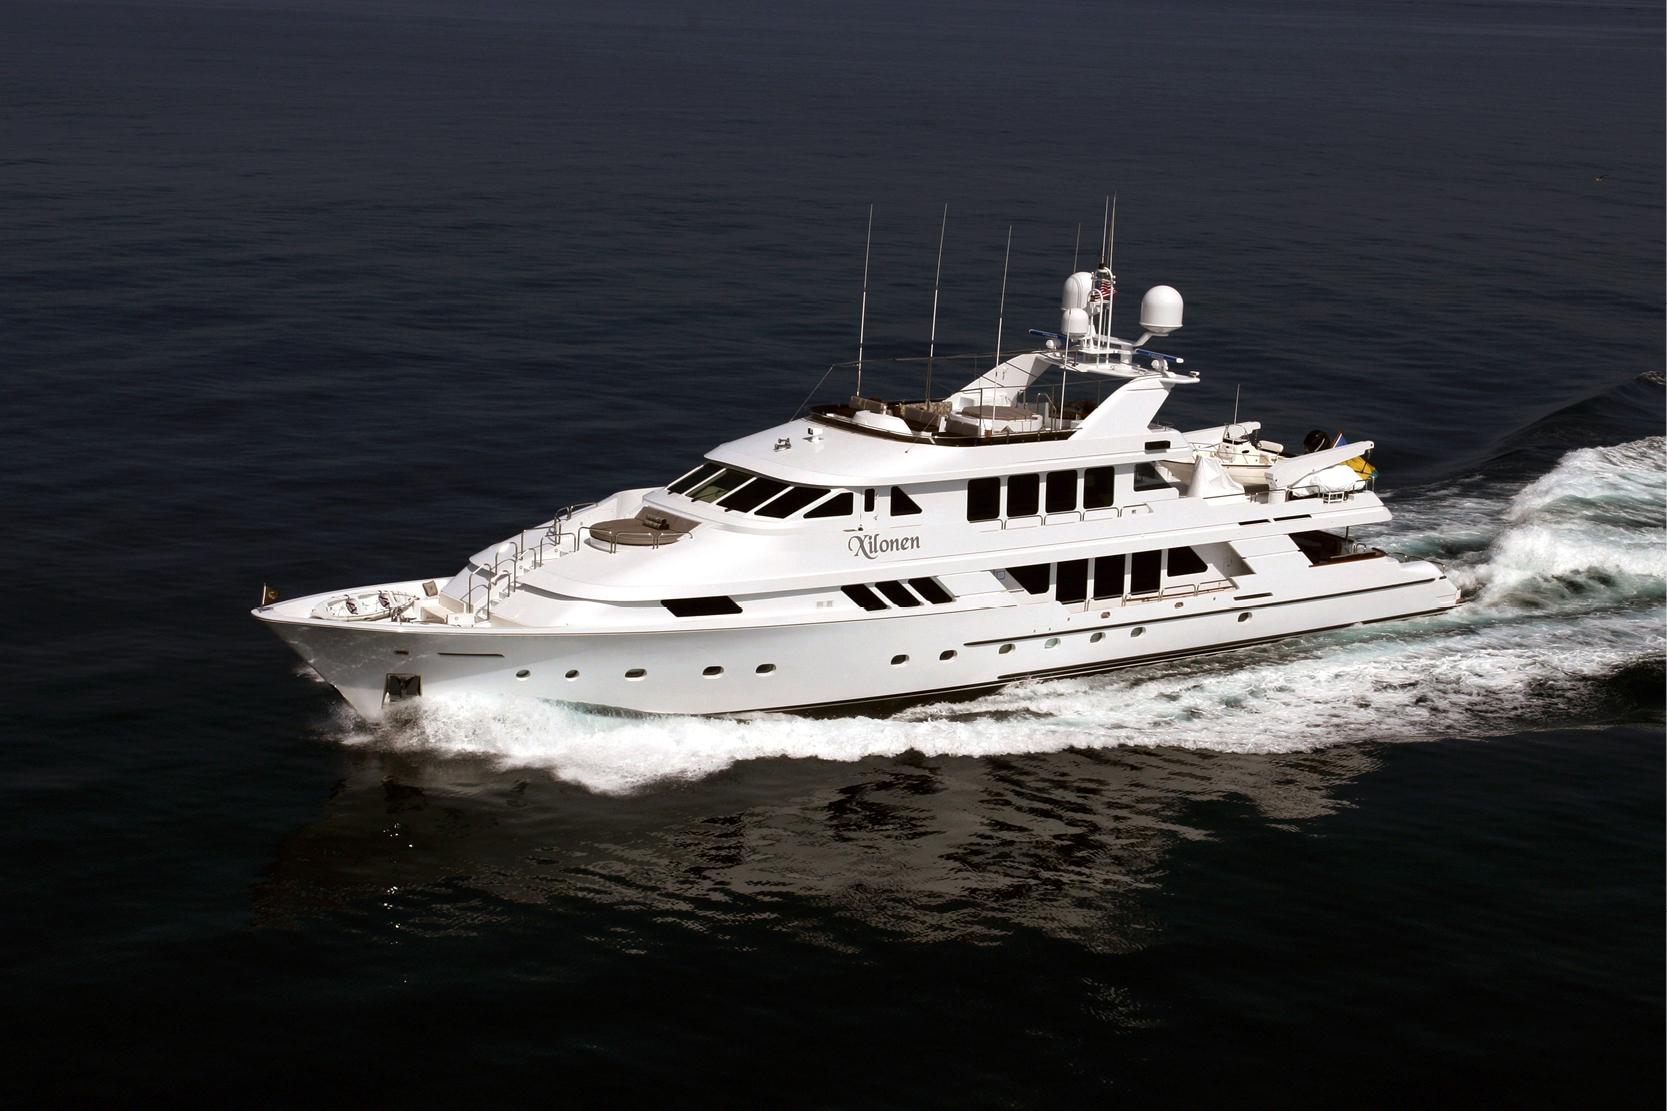 Karen-Lynn-Interior-Design-Yacht-Xilonen_2.jpg